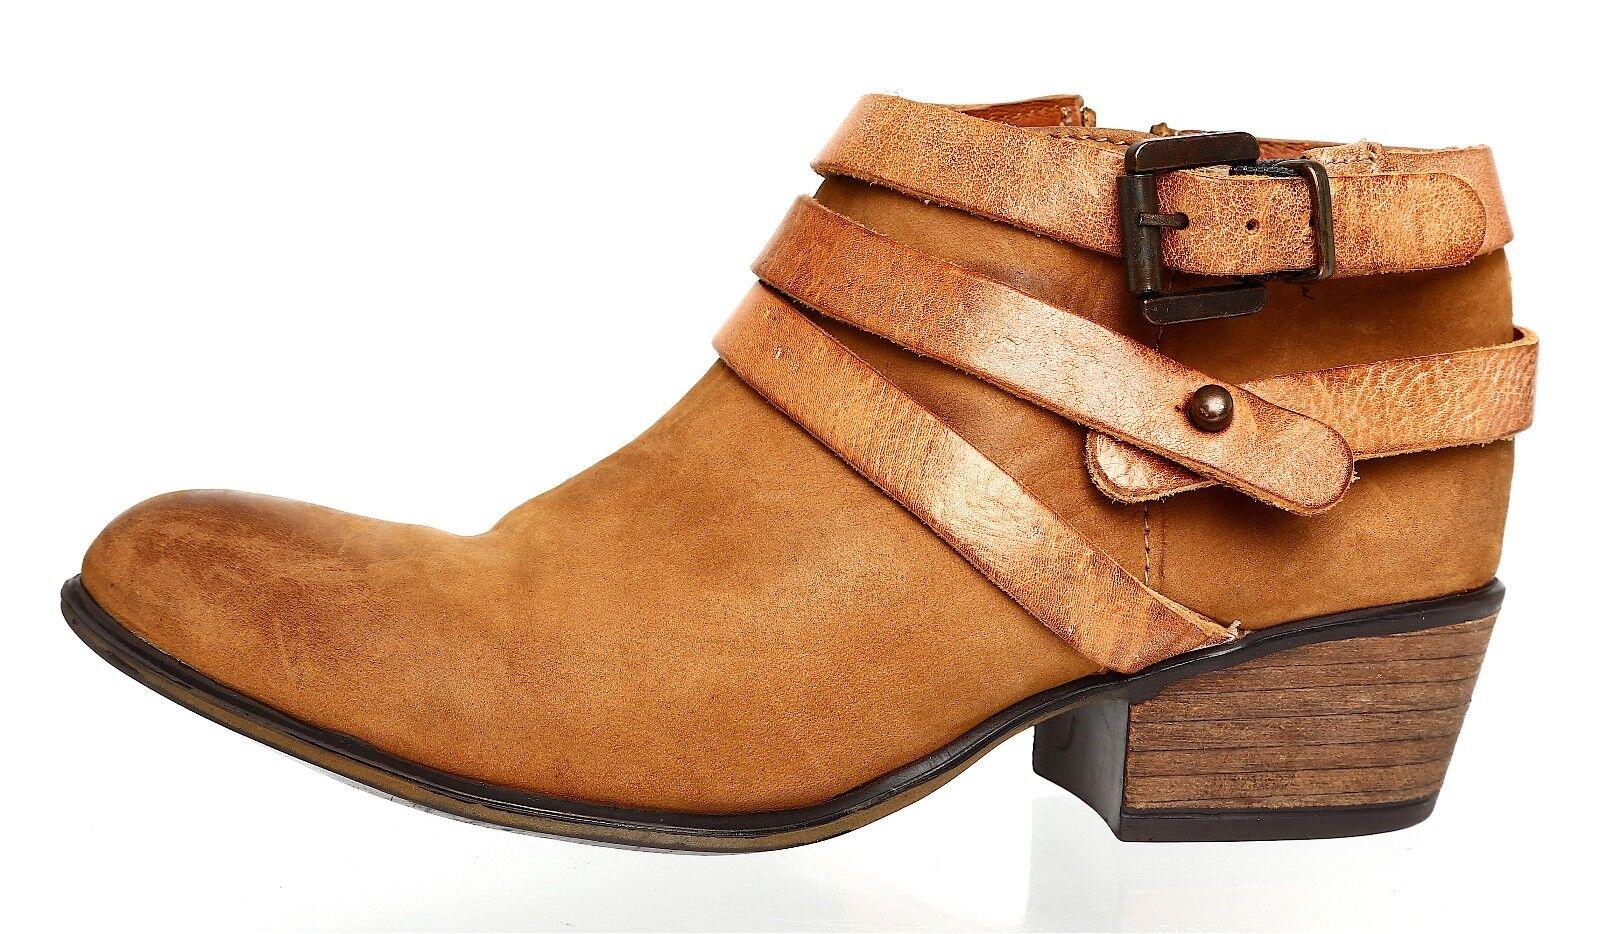 Steve Madden Regennt Leather démarrageie marron femmes Sz 6.5 M 4076